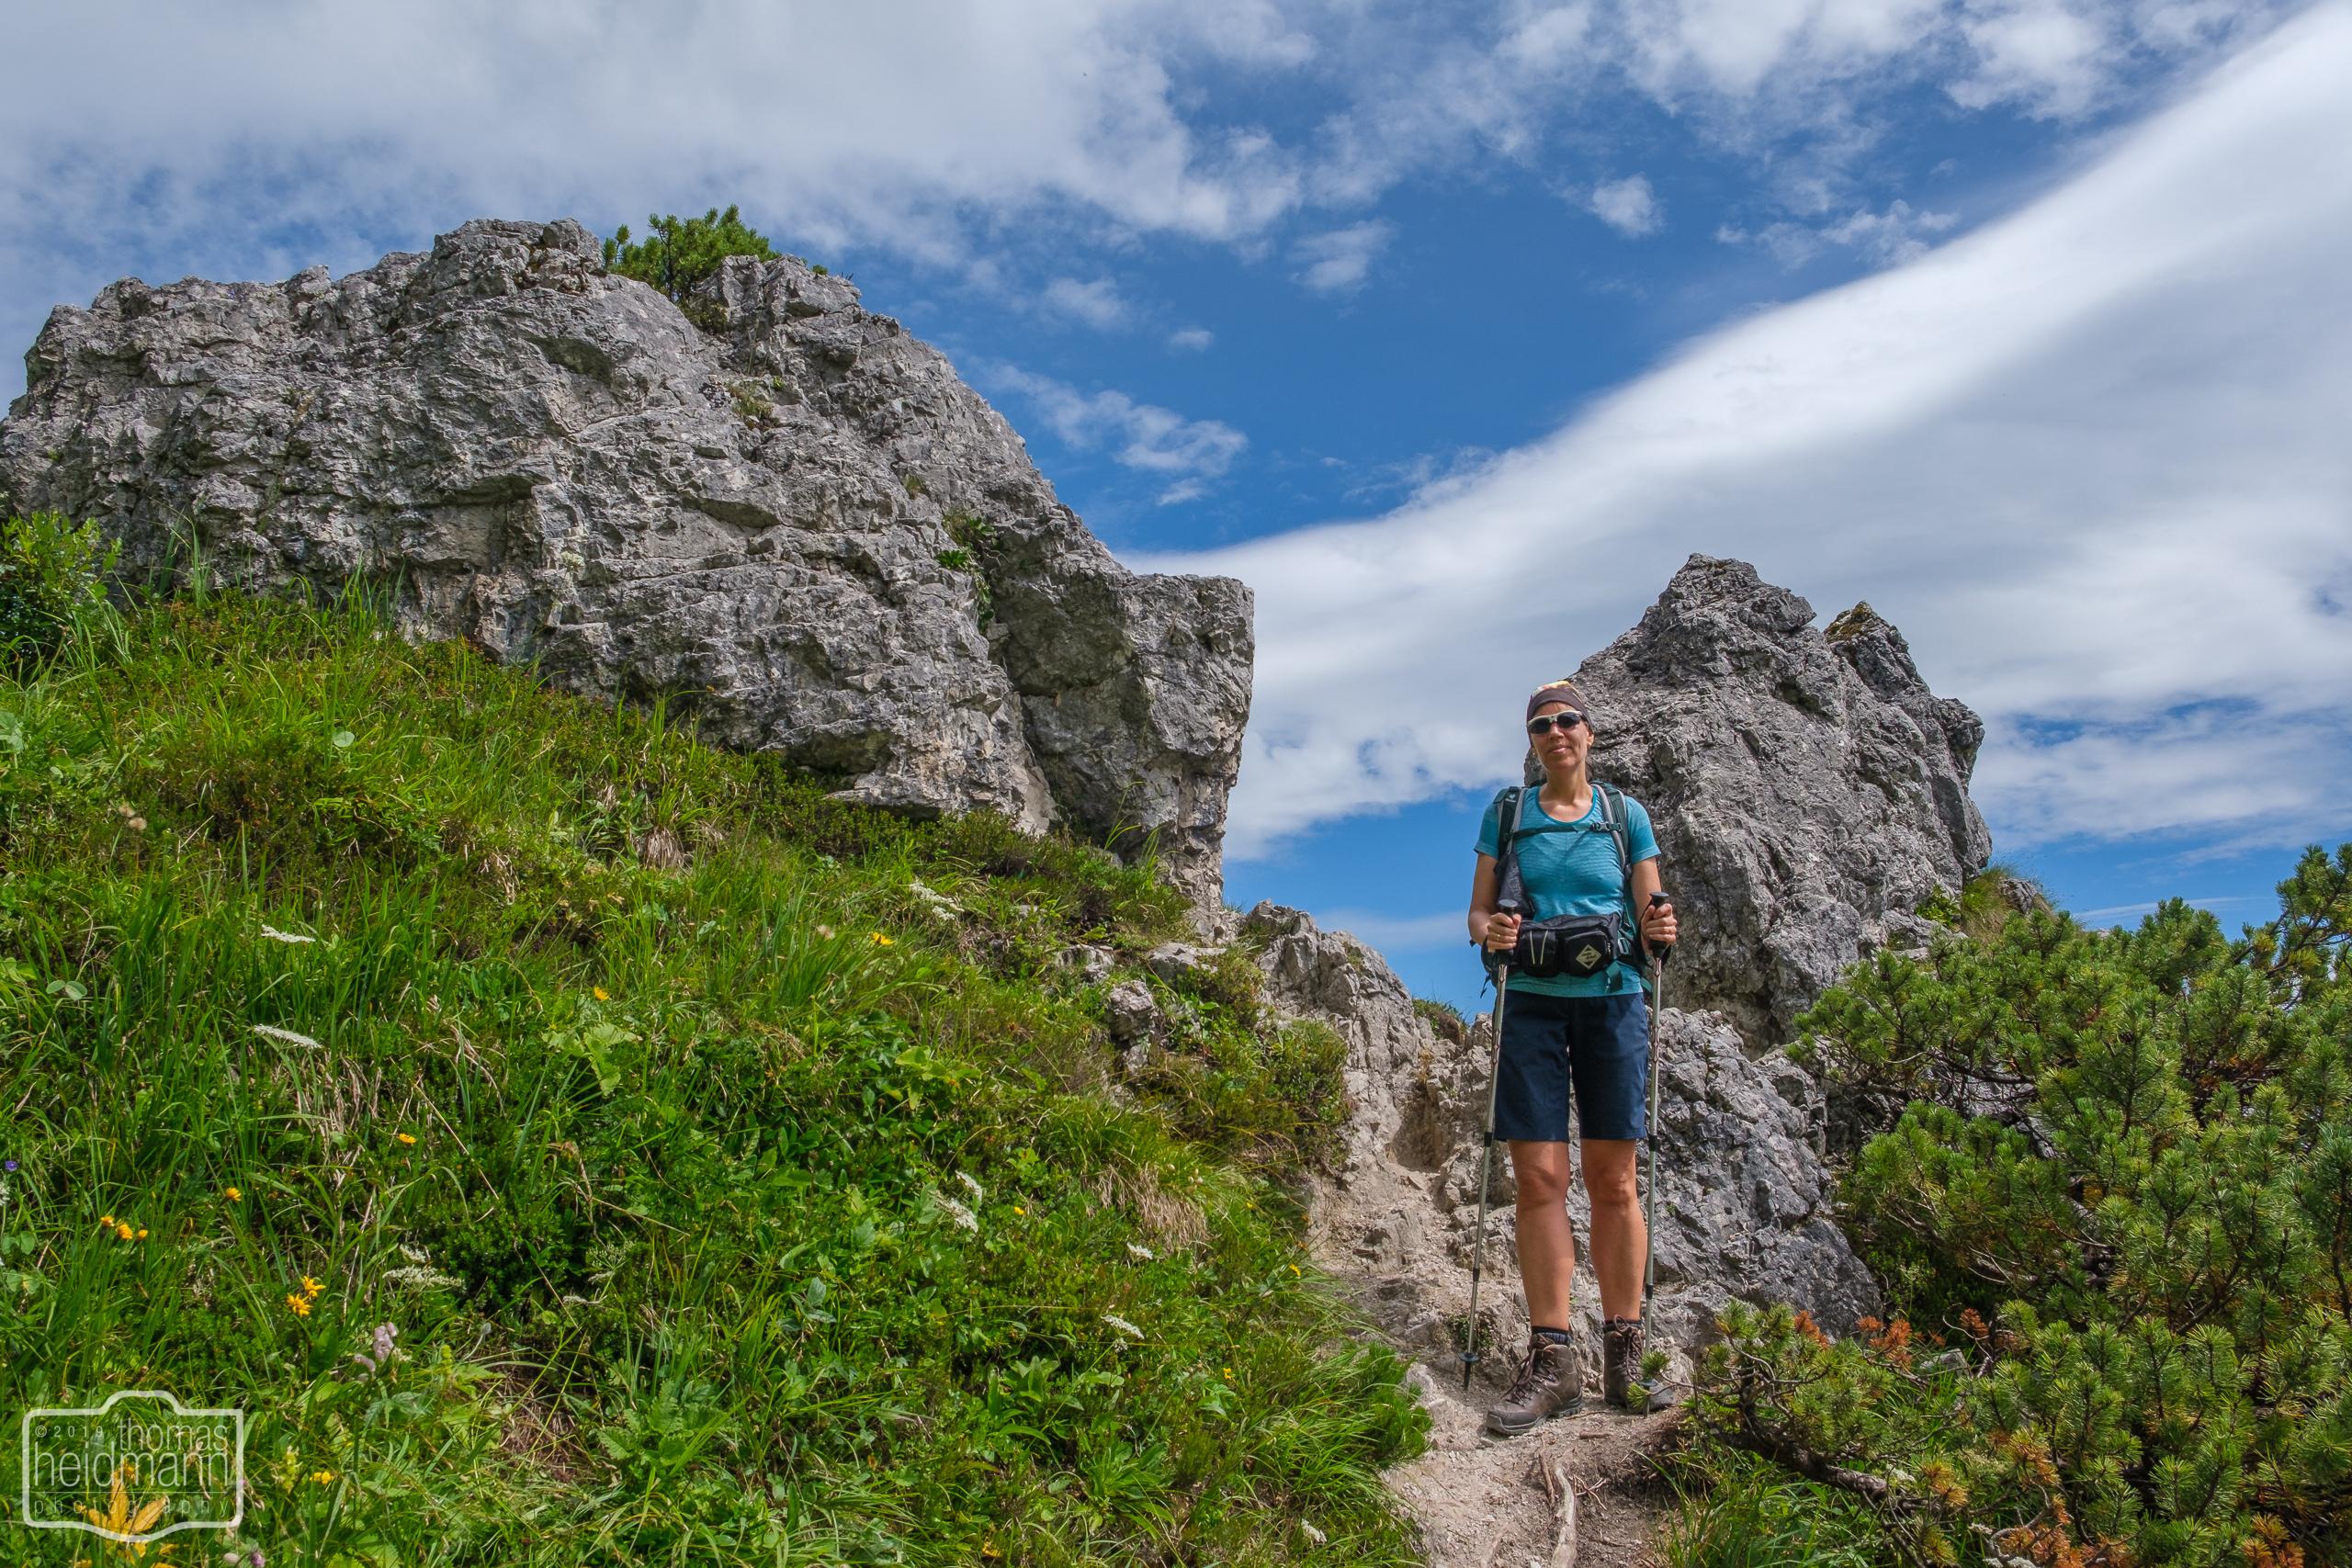 Wanderung zum Jenner-Gipfel - fast oben